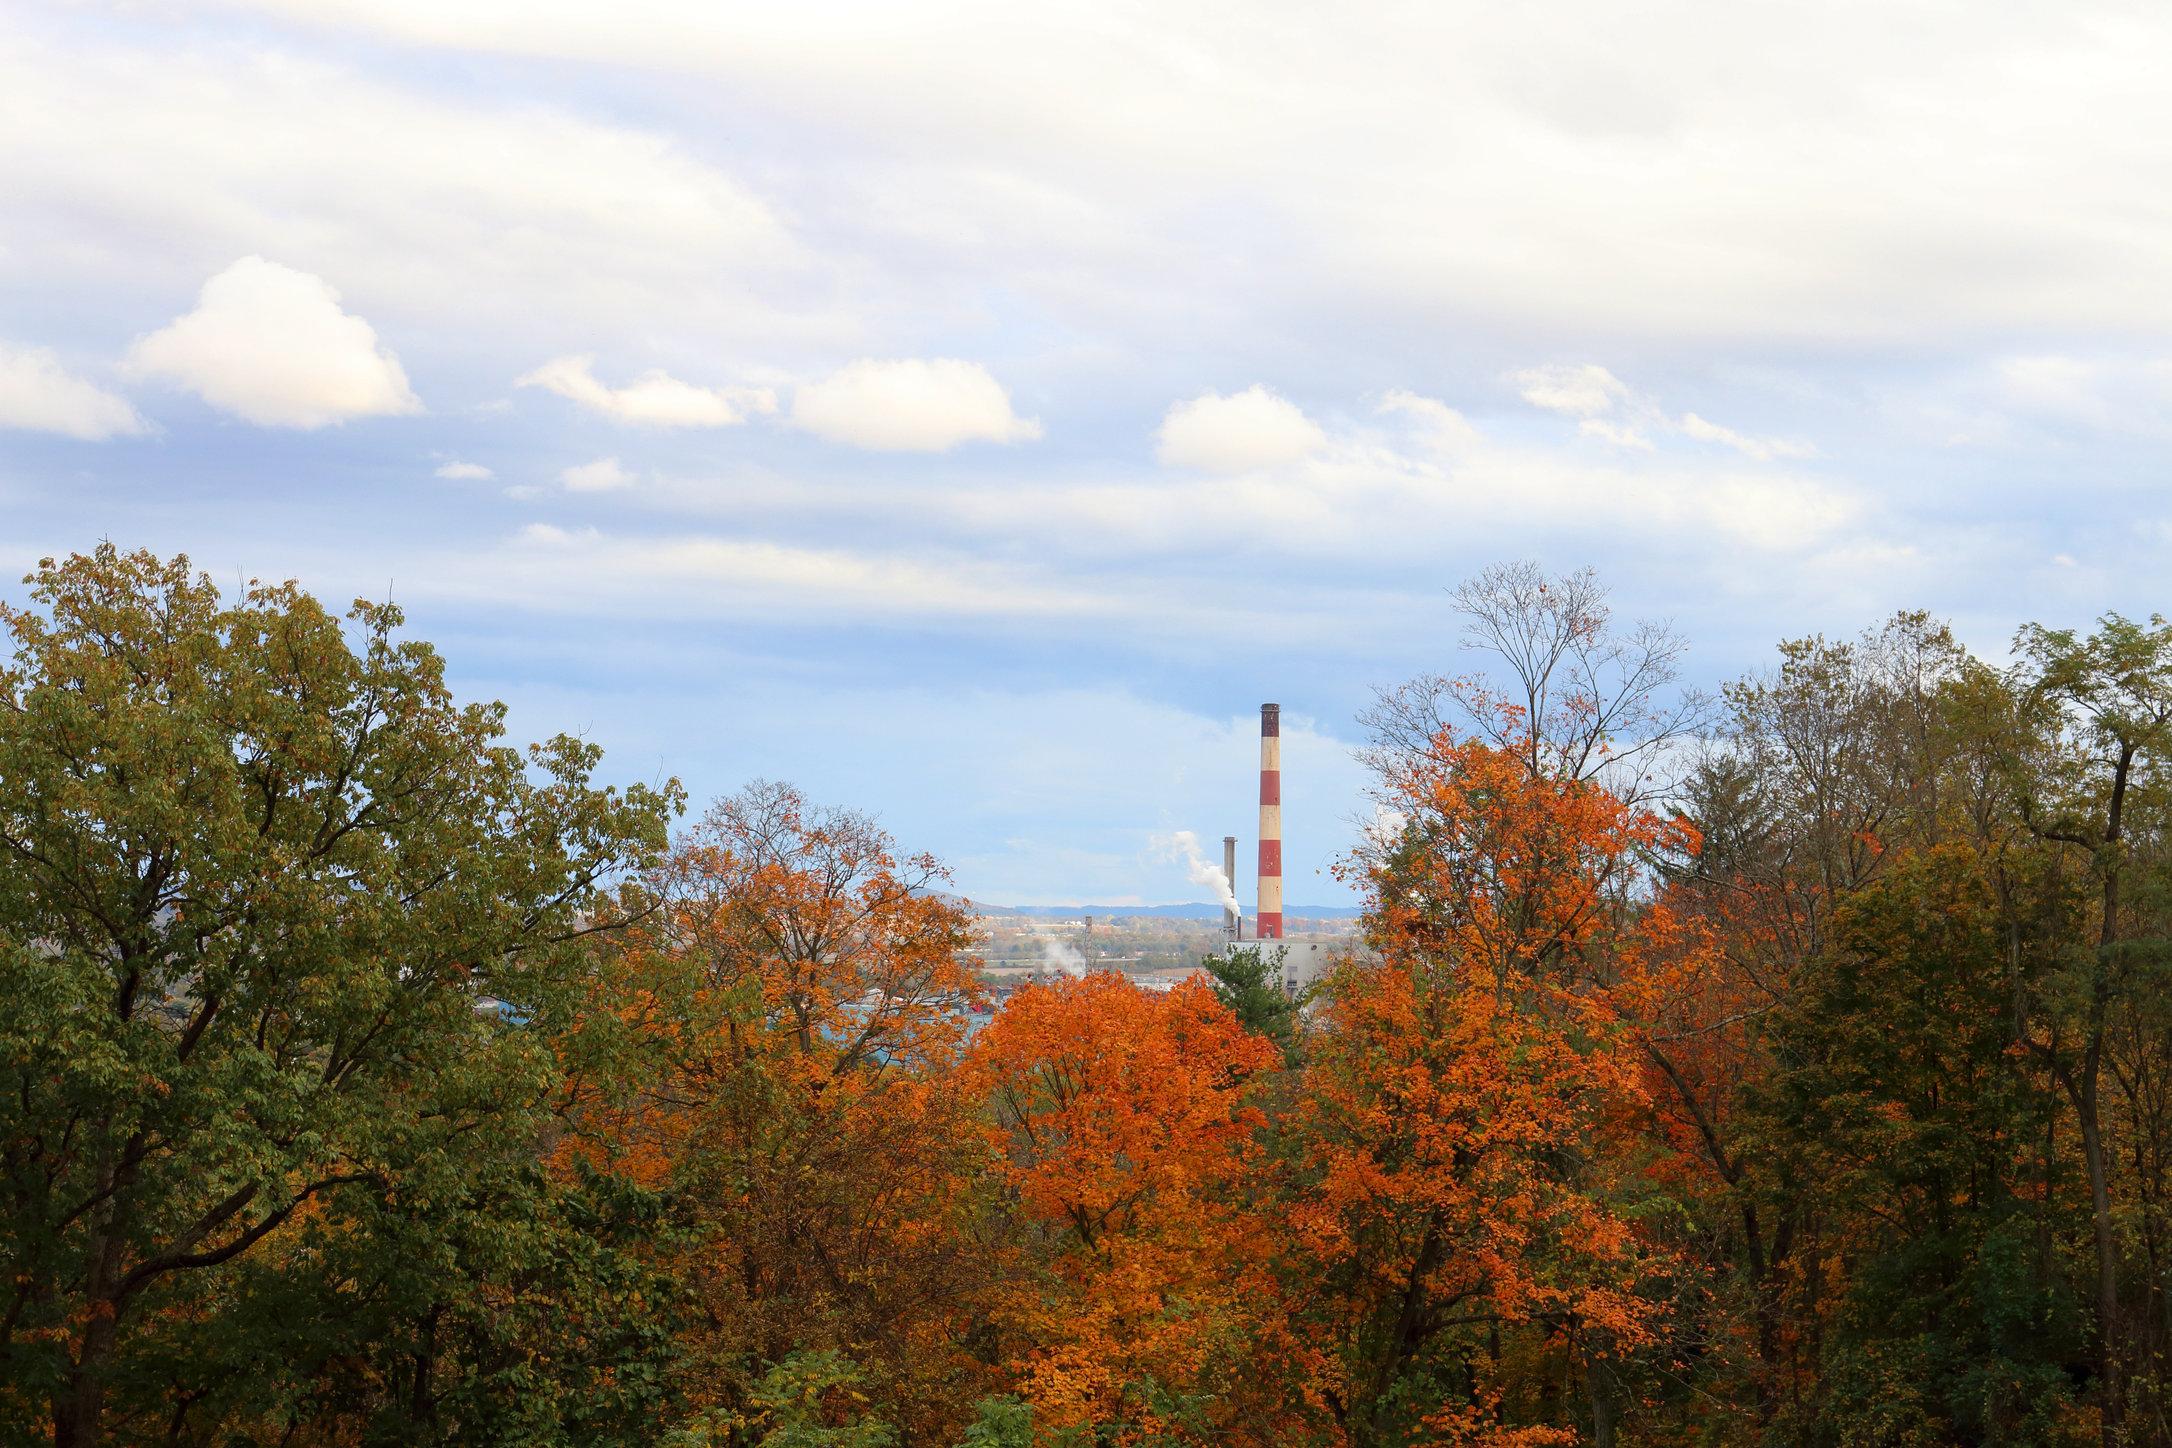 Glatfelter Smokestack; Chillicothe, Ohio.